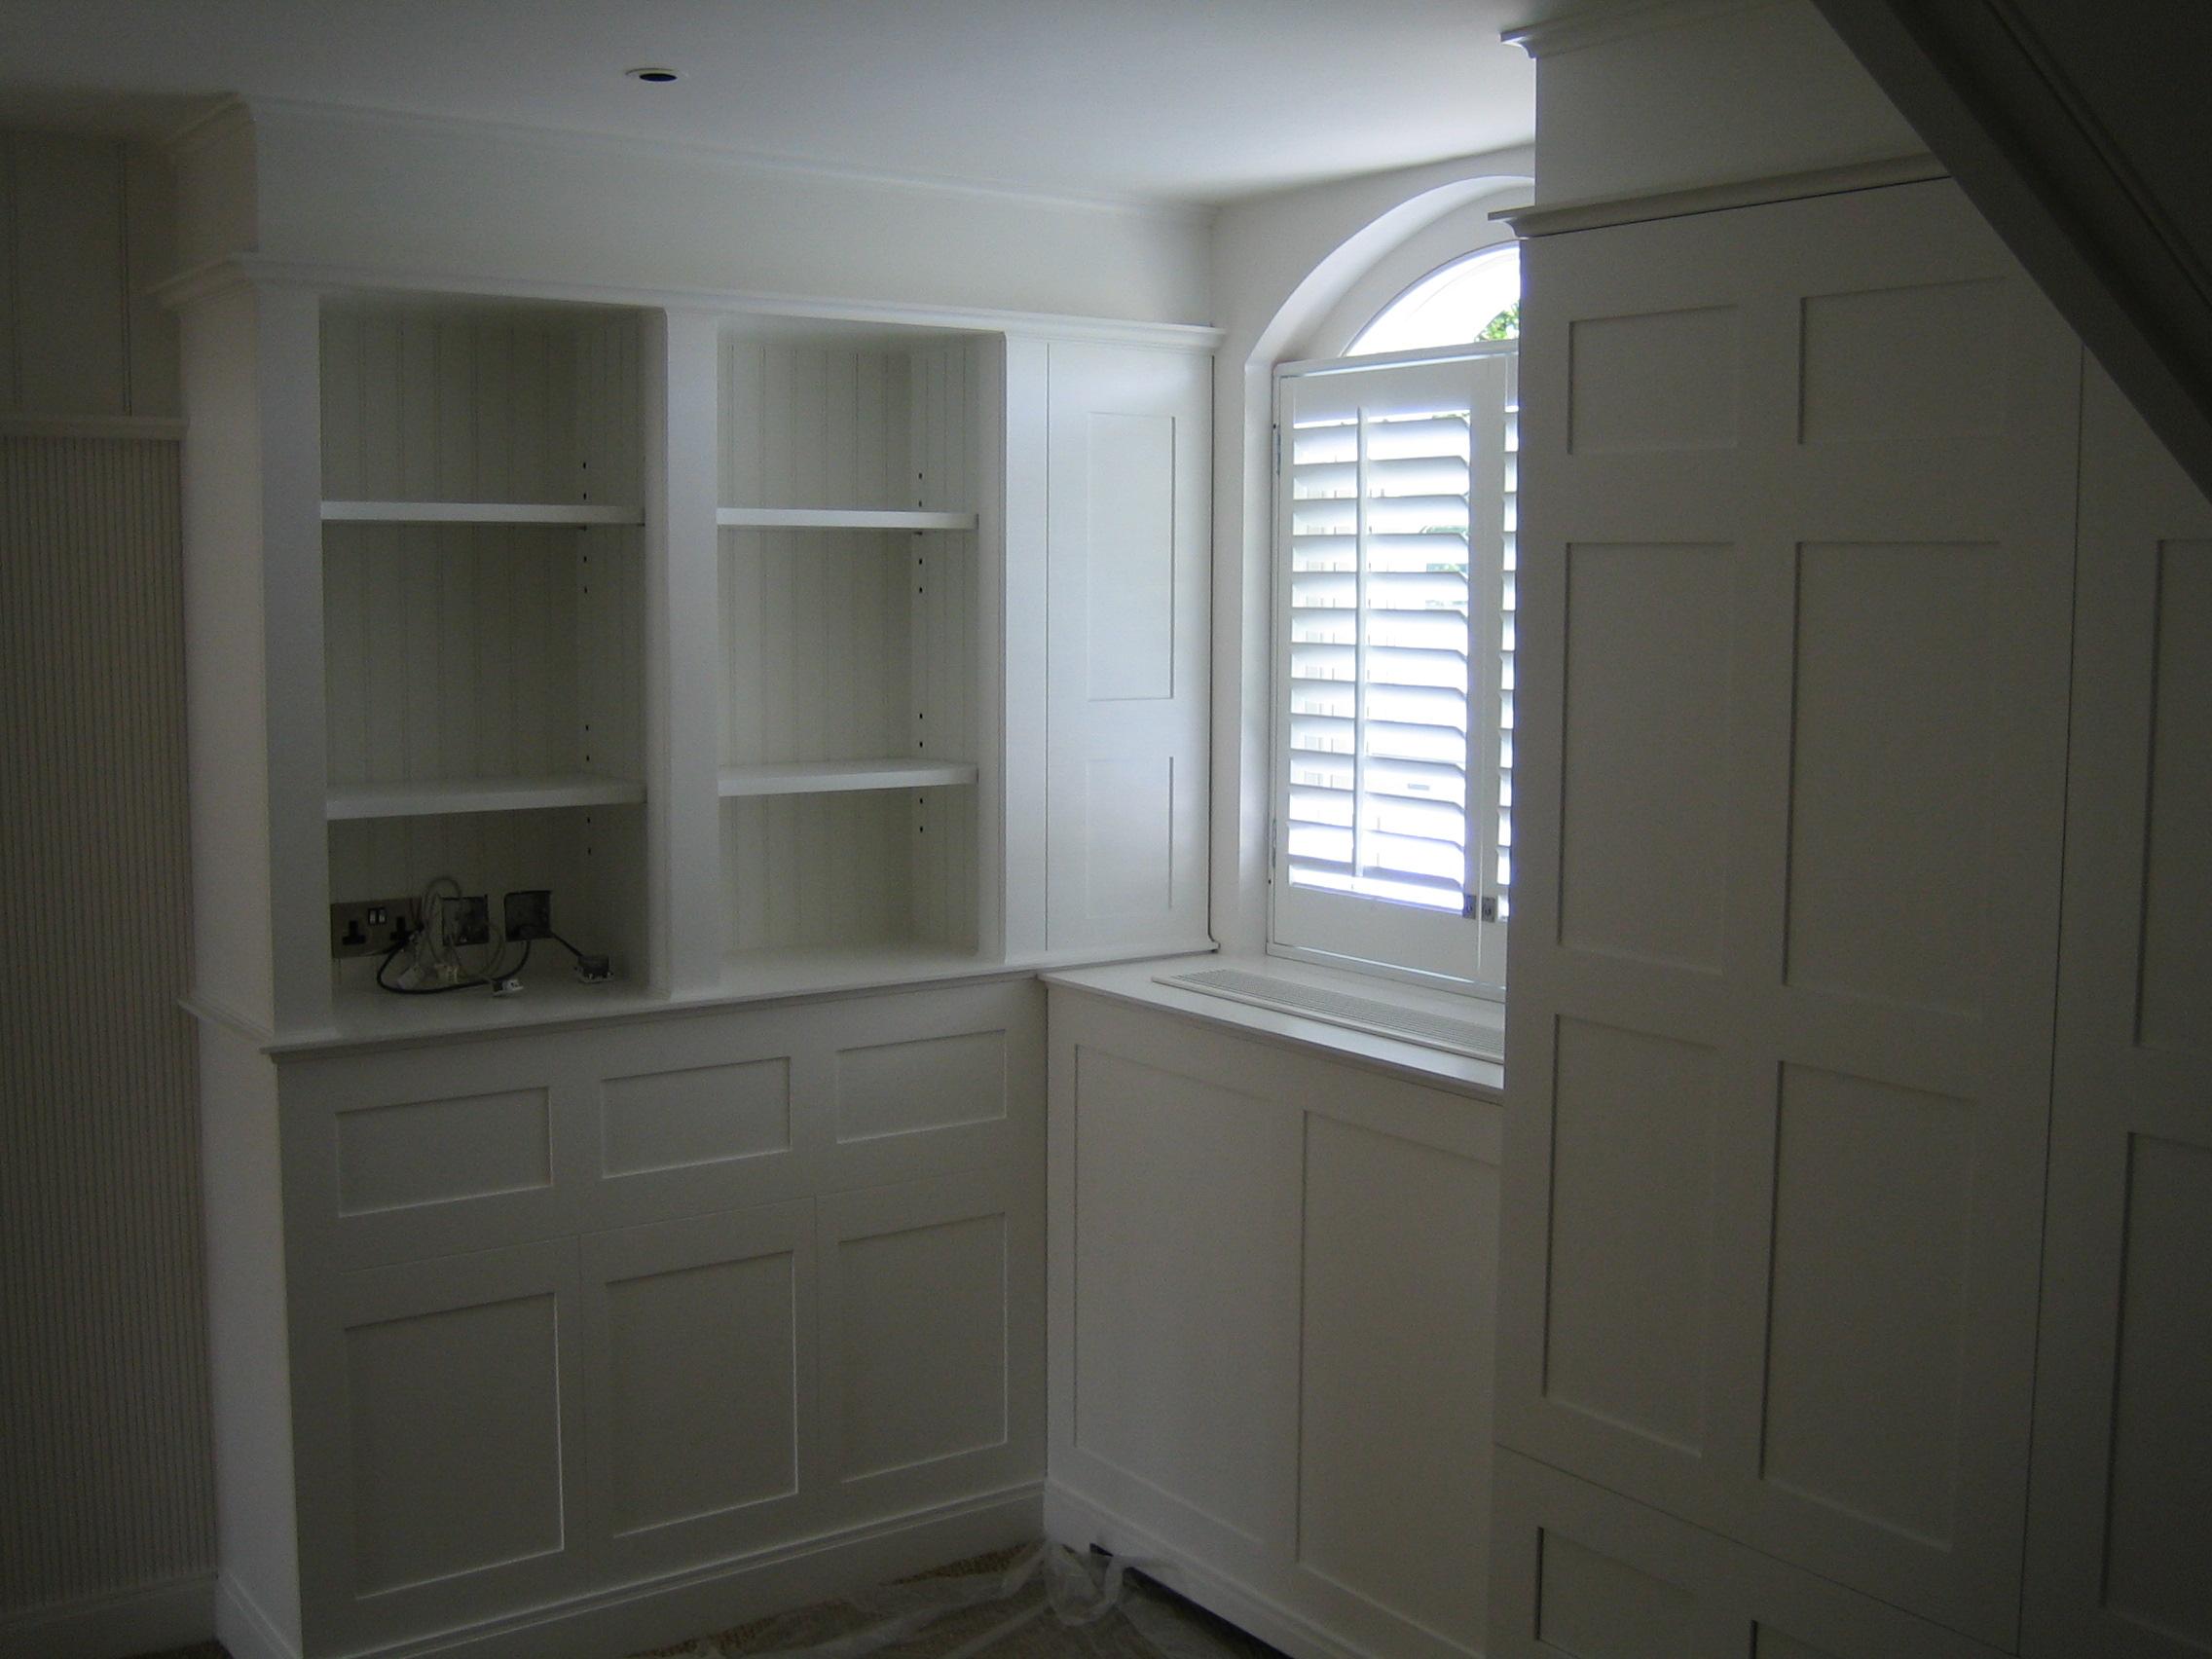 Bespoke carpentry solutions